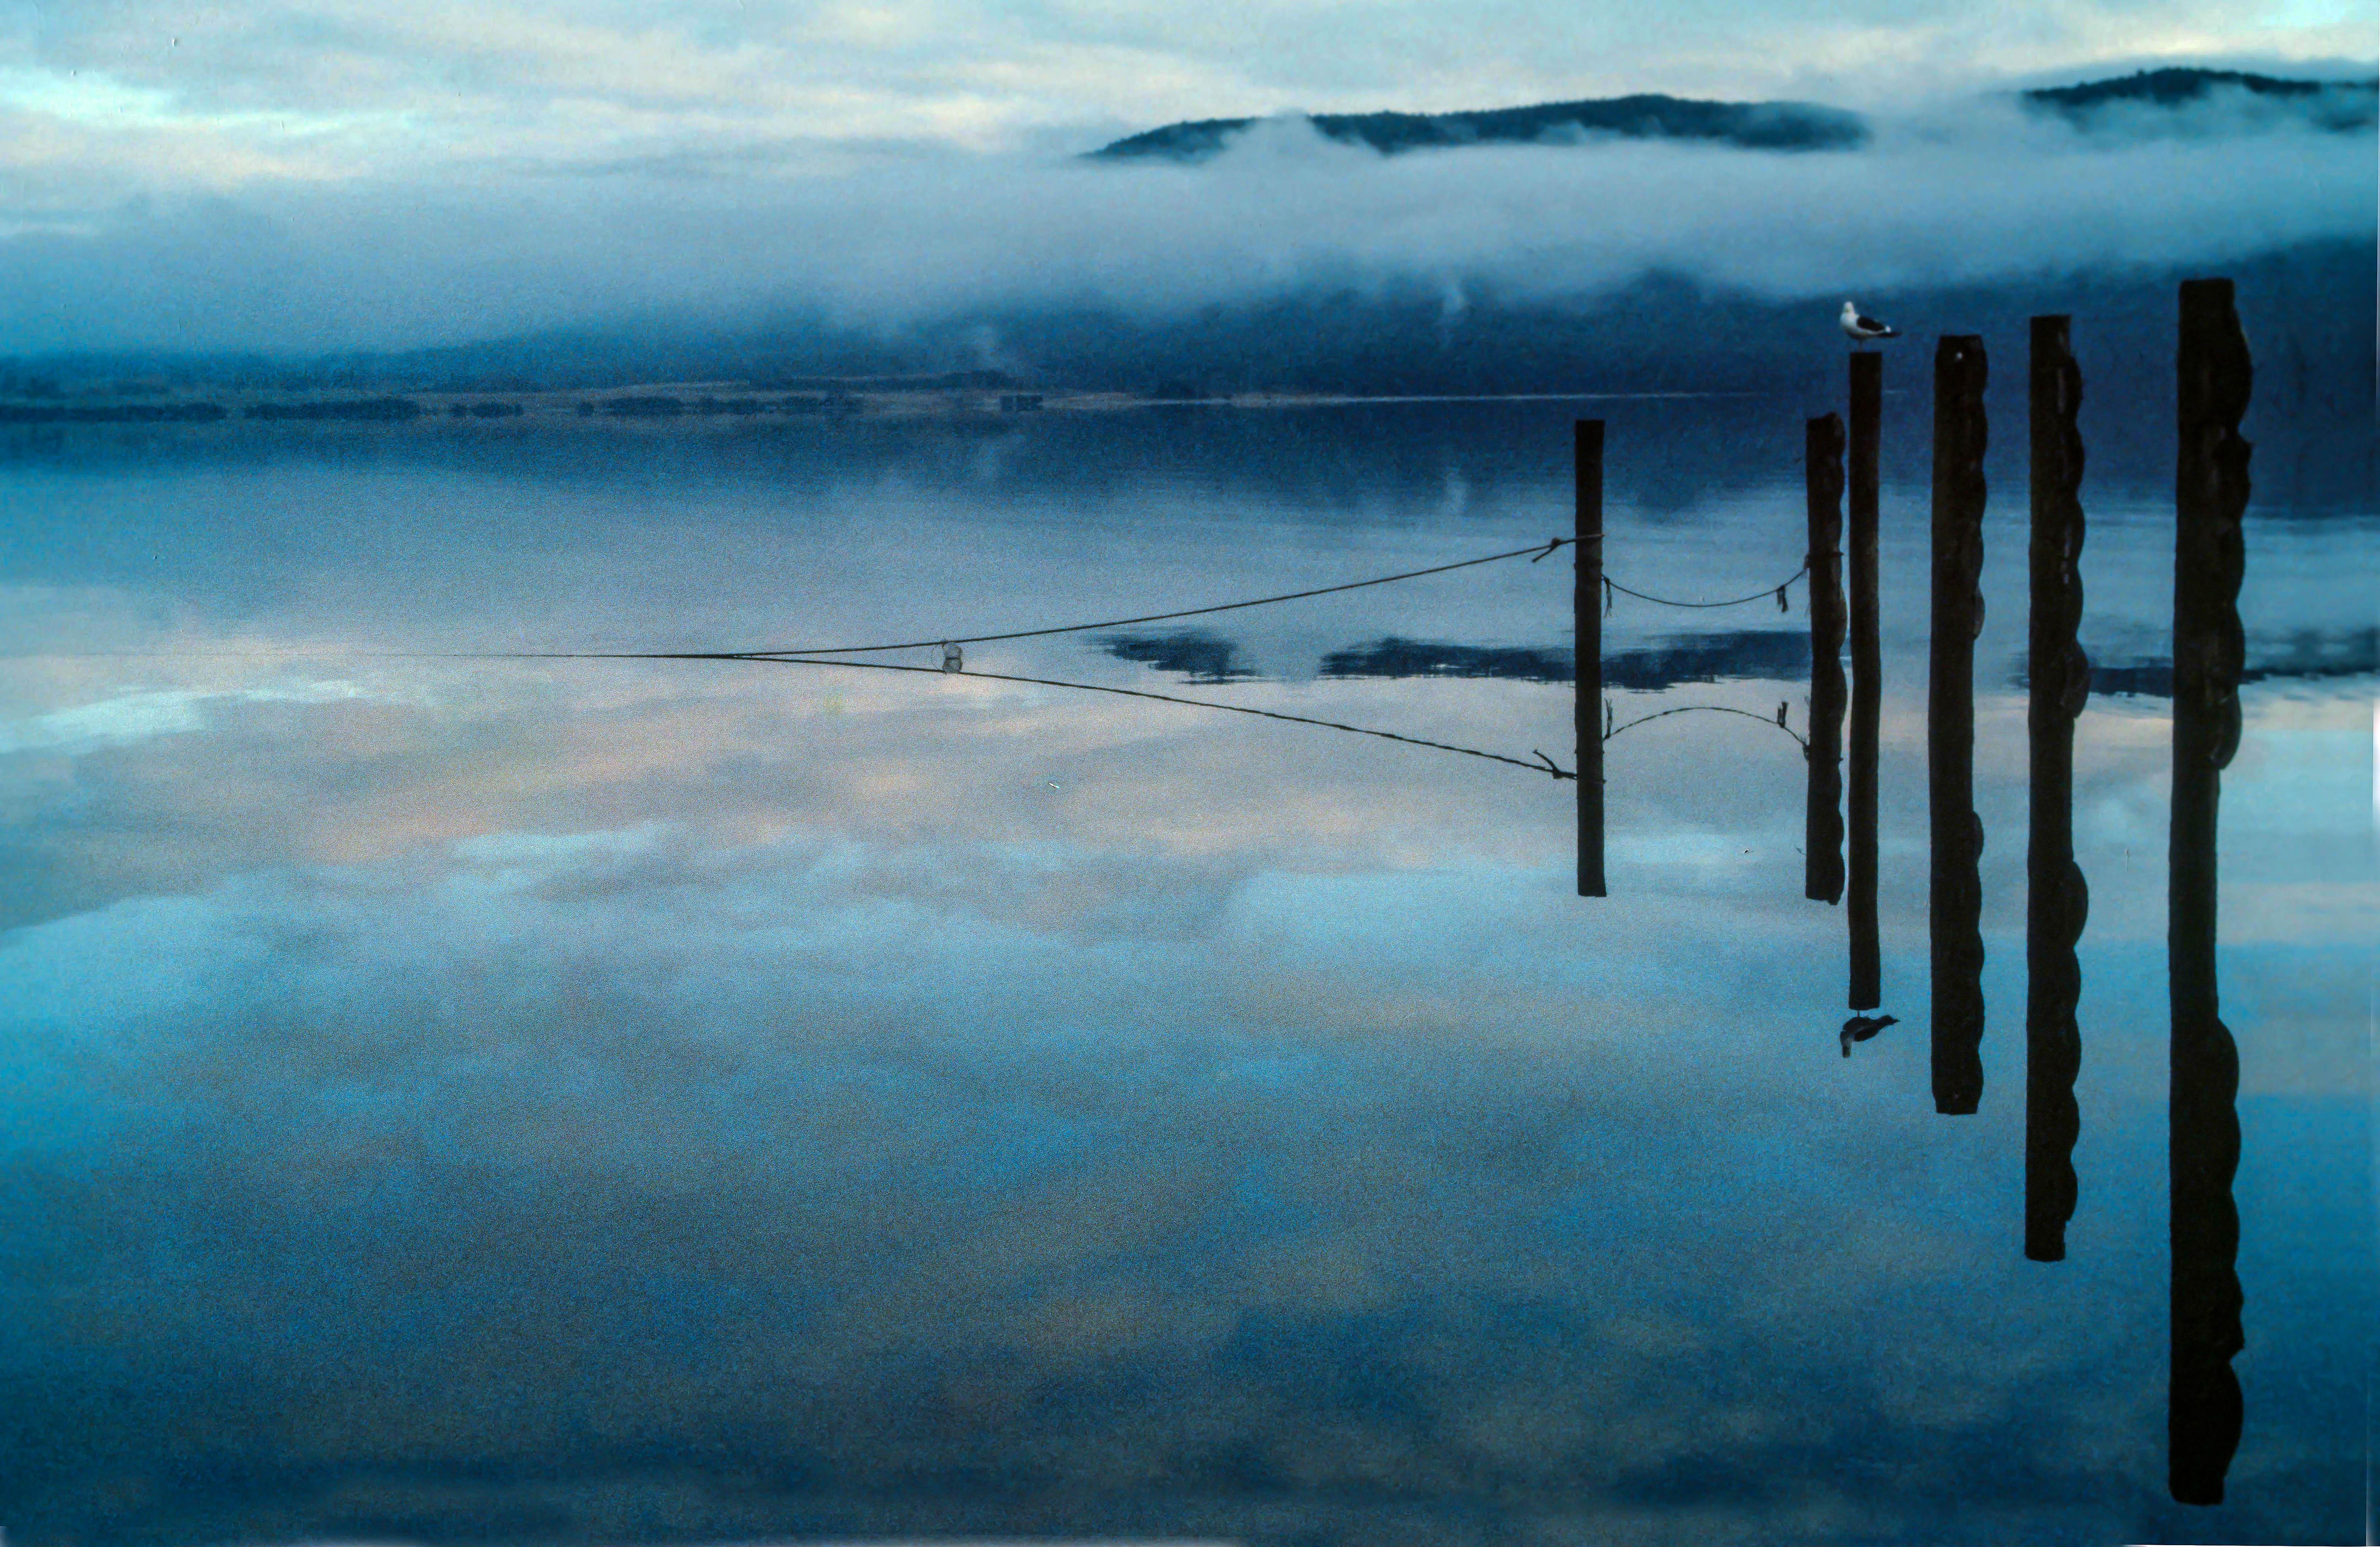 NZ Fiordland Te Anau Lake Reflections 02a.jpg